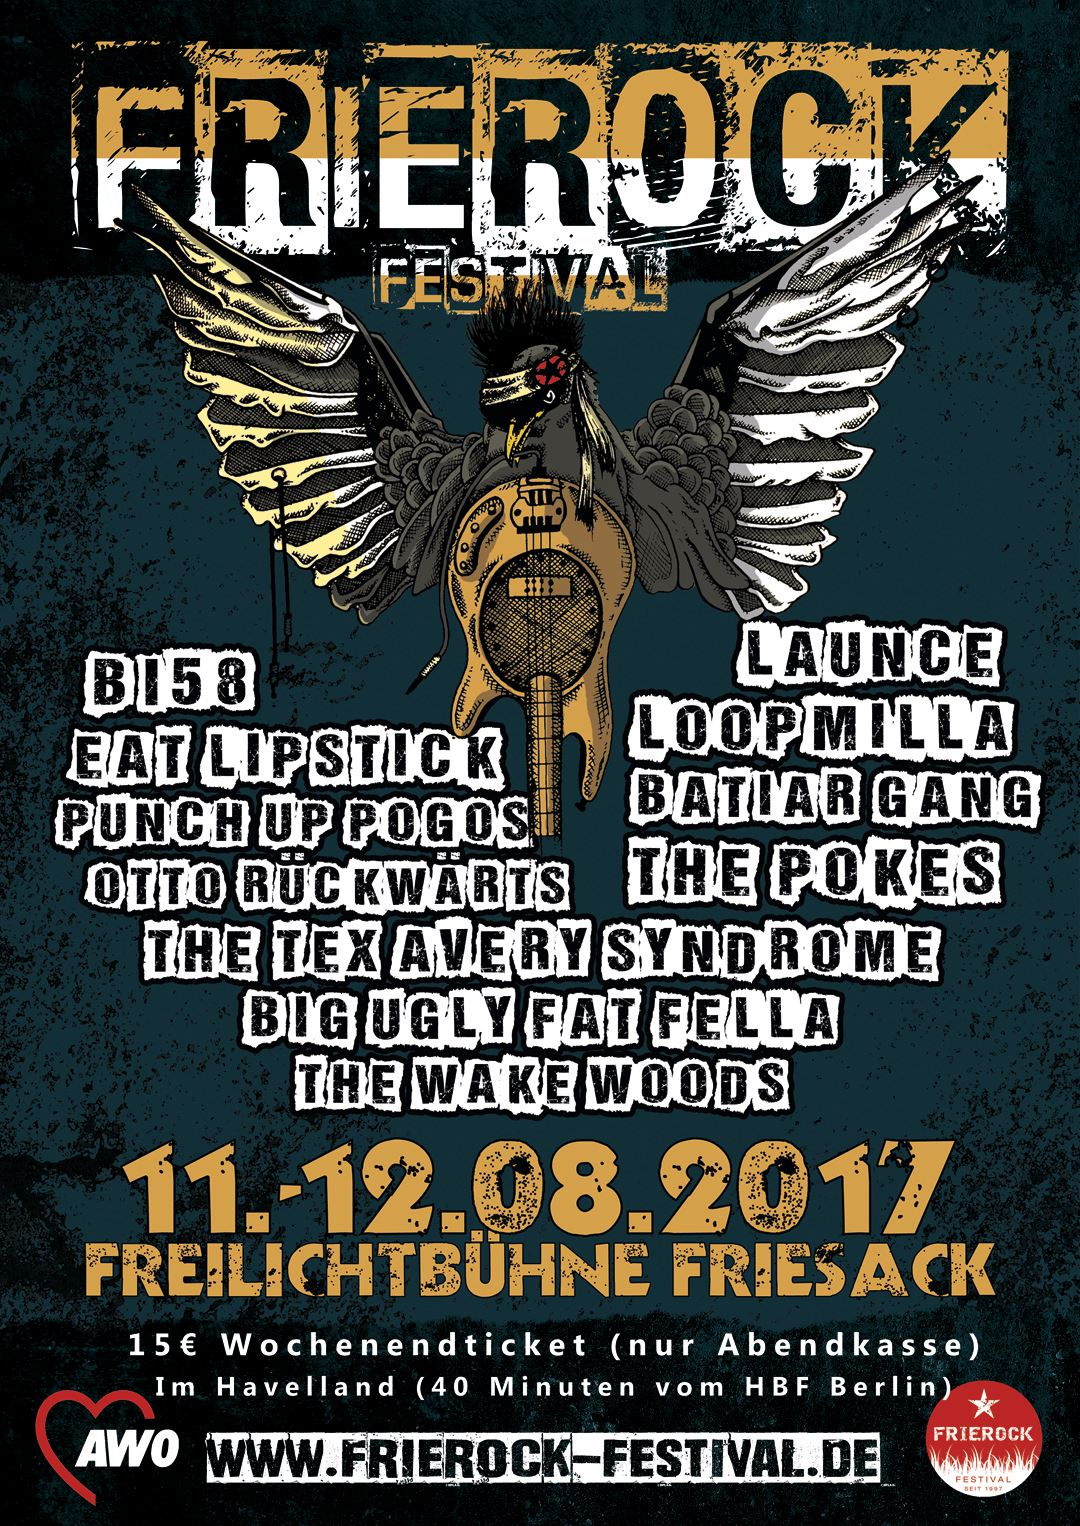 Launce live als Headliner auf dem Frierockfestival